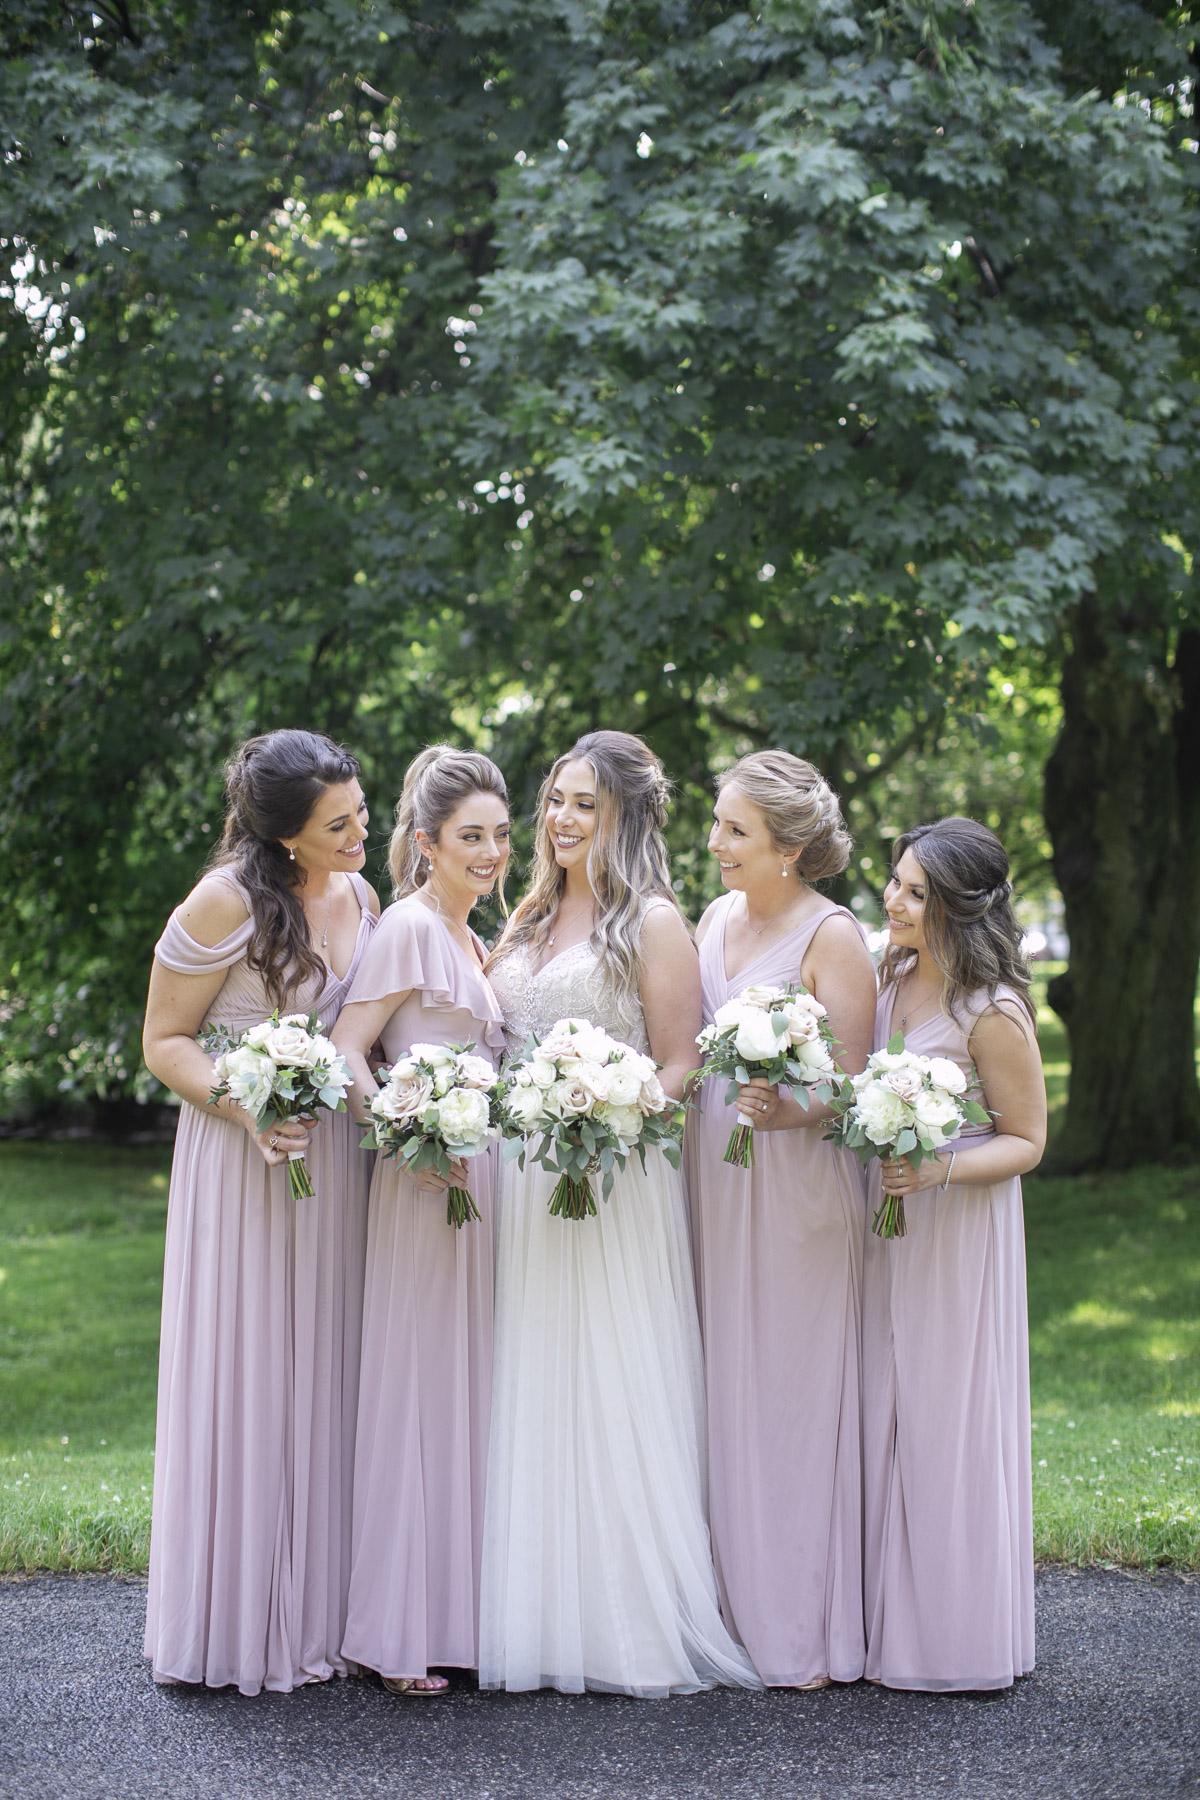 vineyard-bride-philosophy-studios-outdoor-summer-wedding-the-tamahaac-club-niagara-ancaster-toronto-vendor-0047.JPG